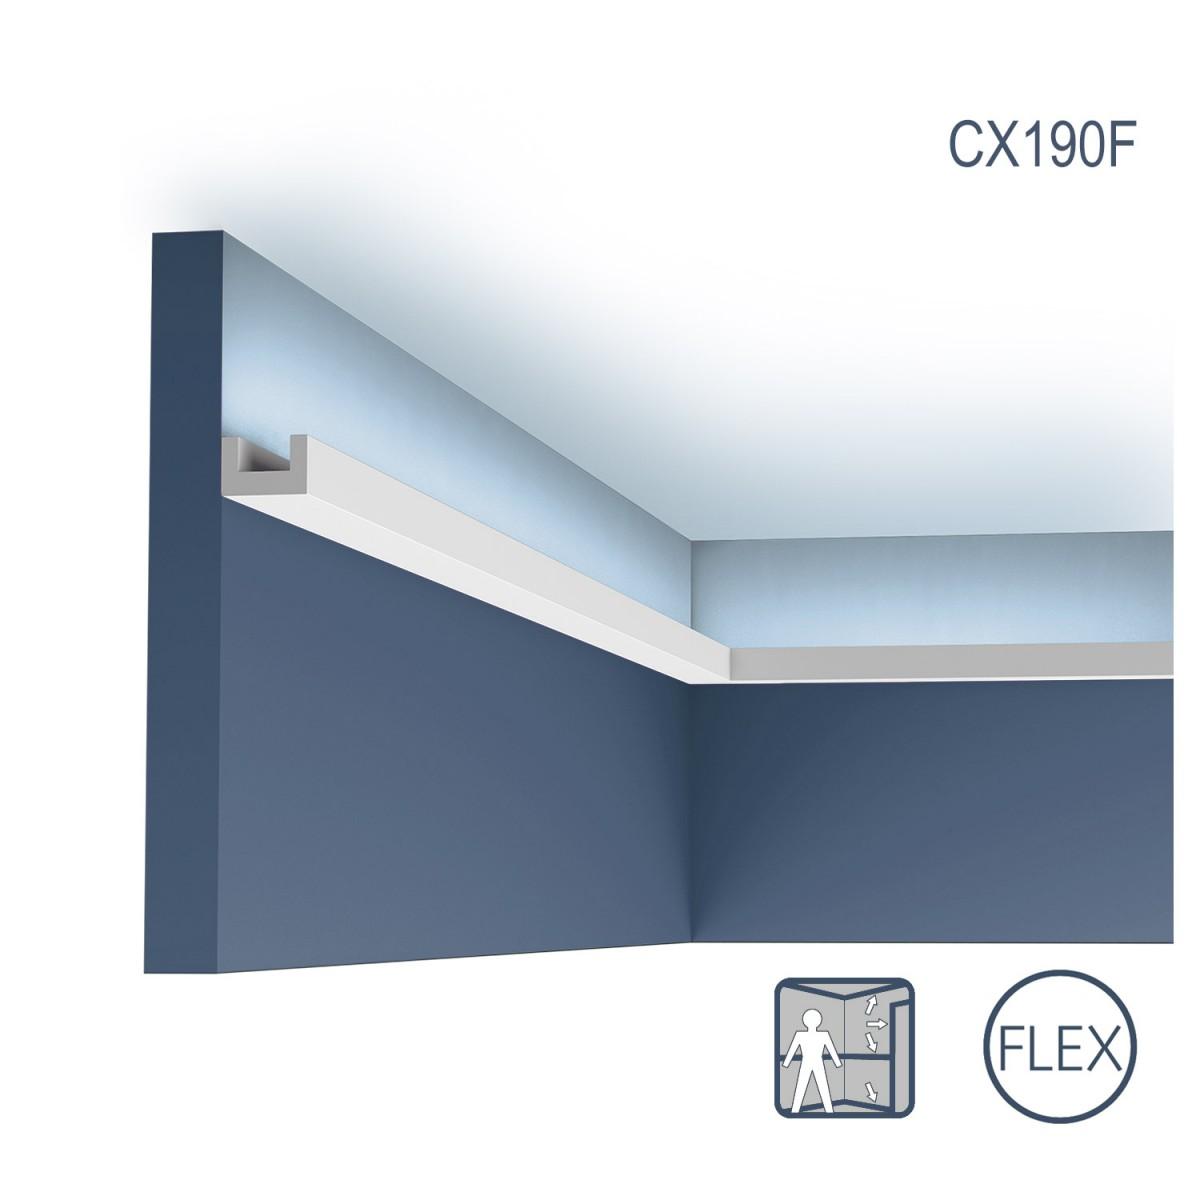 Cornisa Flex Axxent CX190F, Dimensiuni: 200 X 2 X 3 cm, Orac Decor